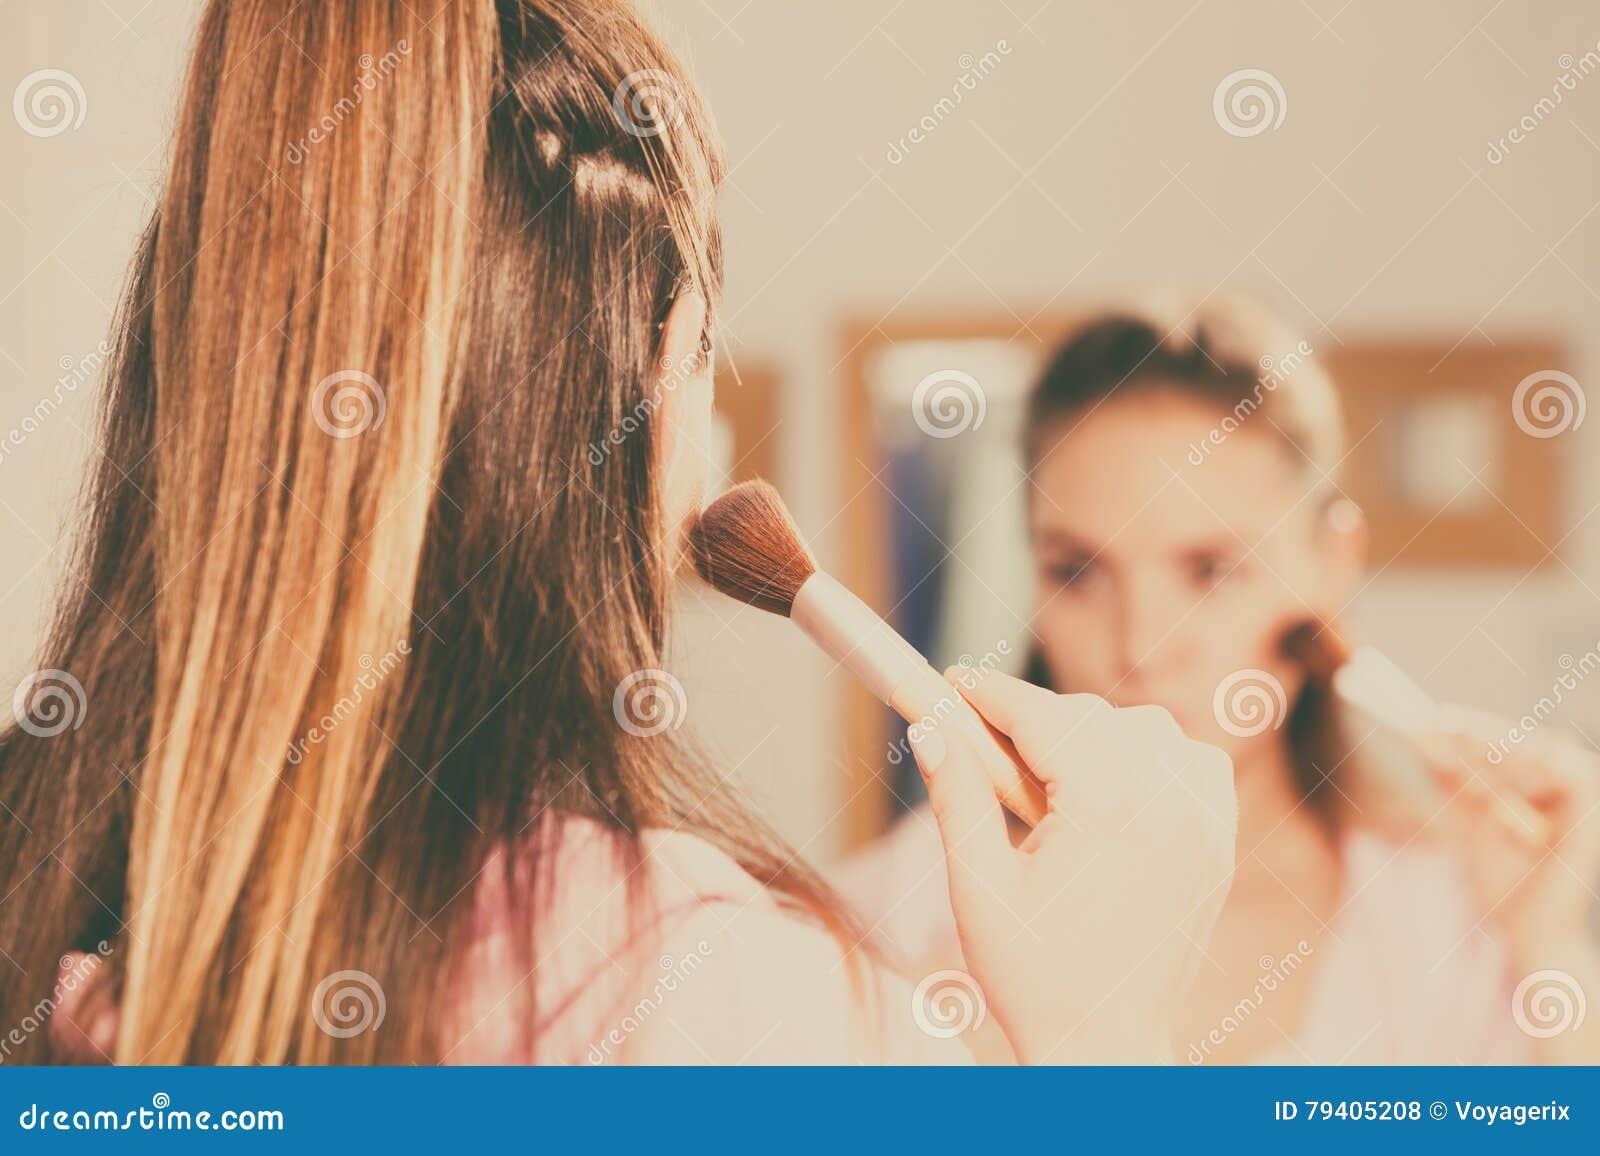 Woman Applying Bronzing Powder With Brush To Her Skin Woman Applying  Bronzing Powder With Brush To